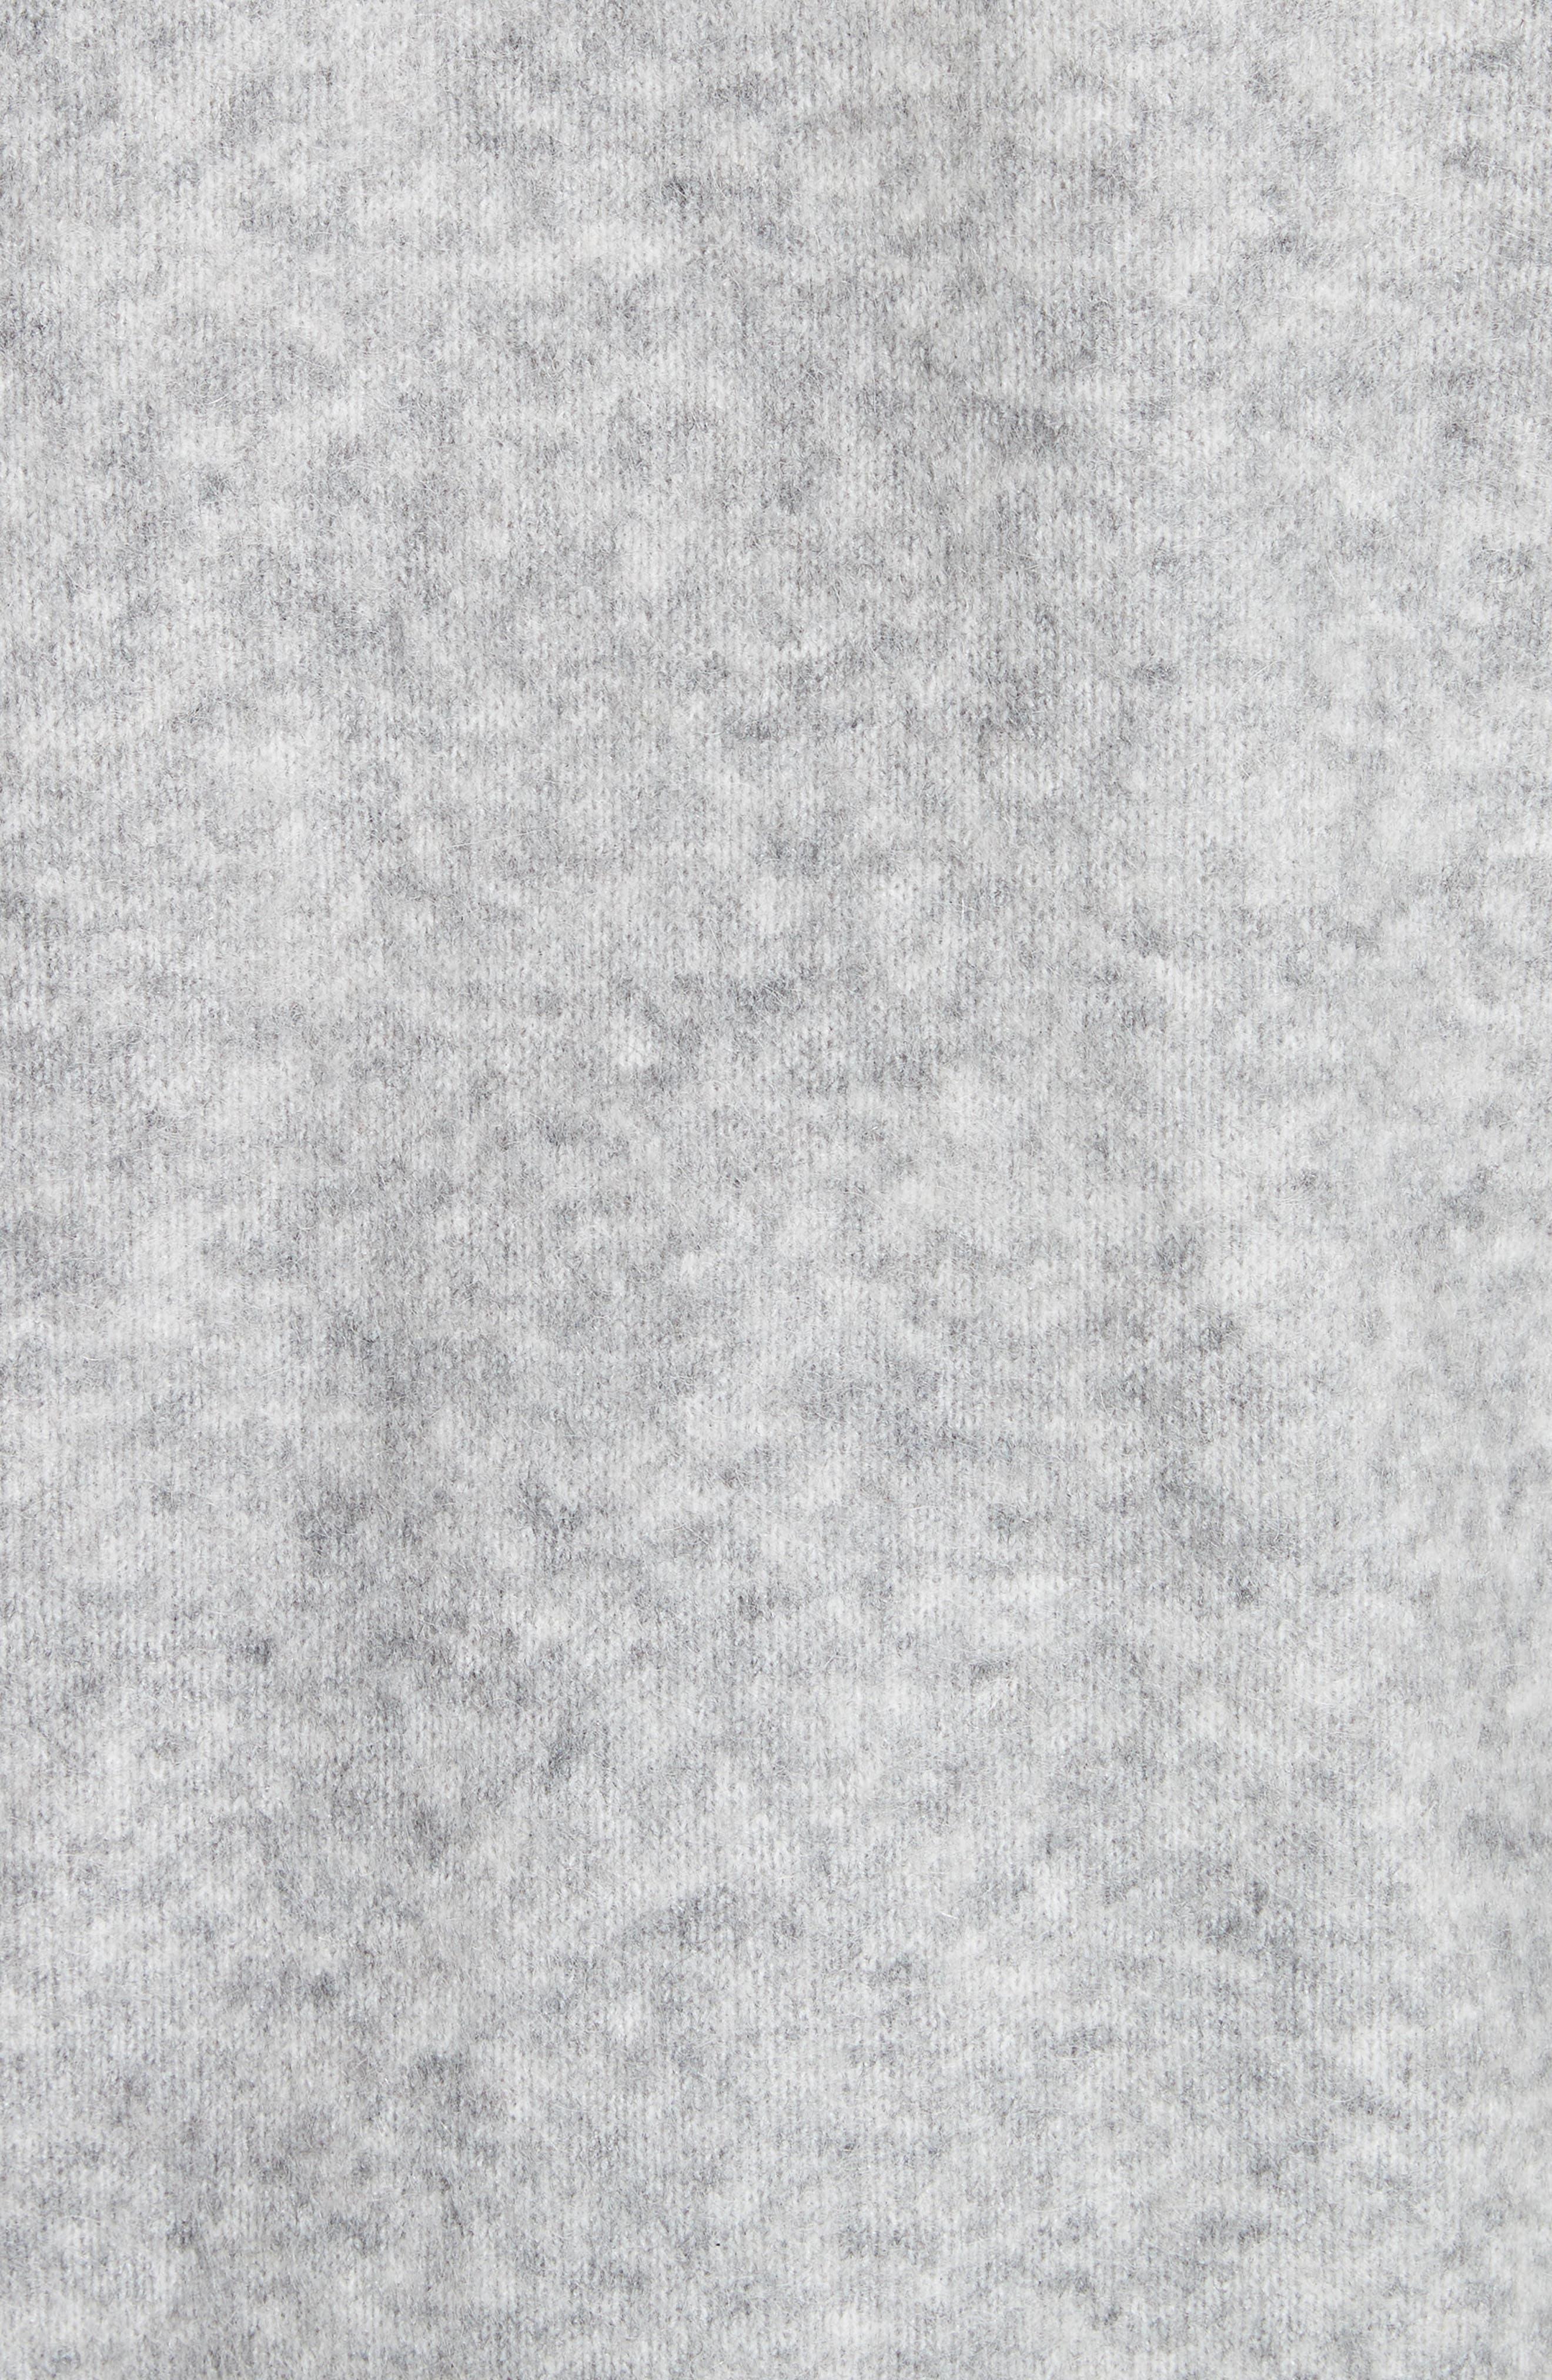 Raya Sh Mohair Knit Cardigan,                             Alternate thumbnail 4, color,                             Husky Grey